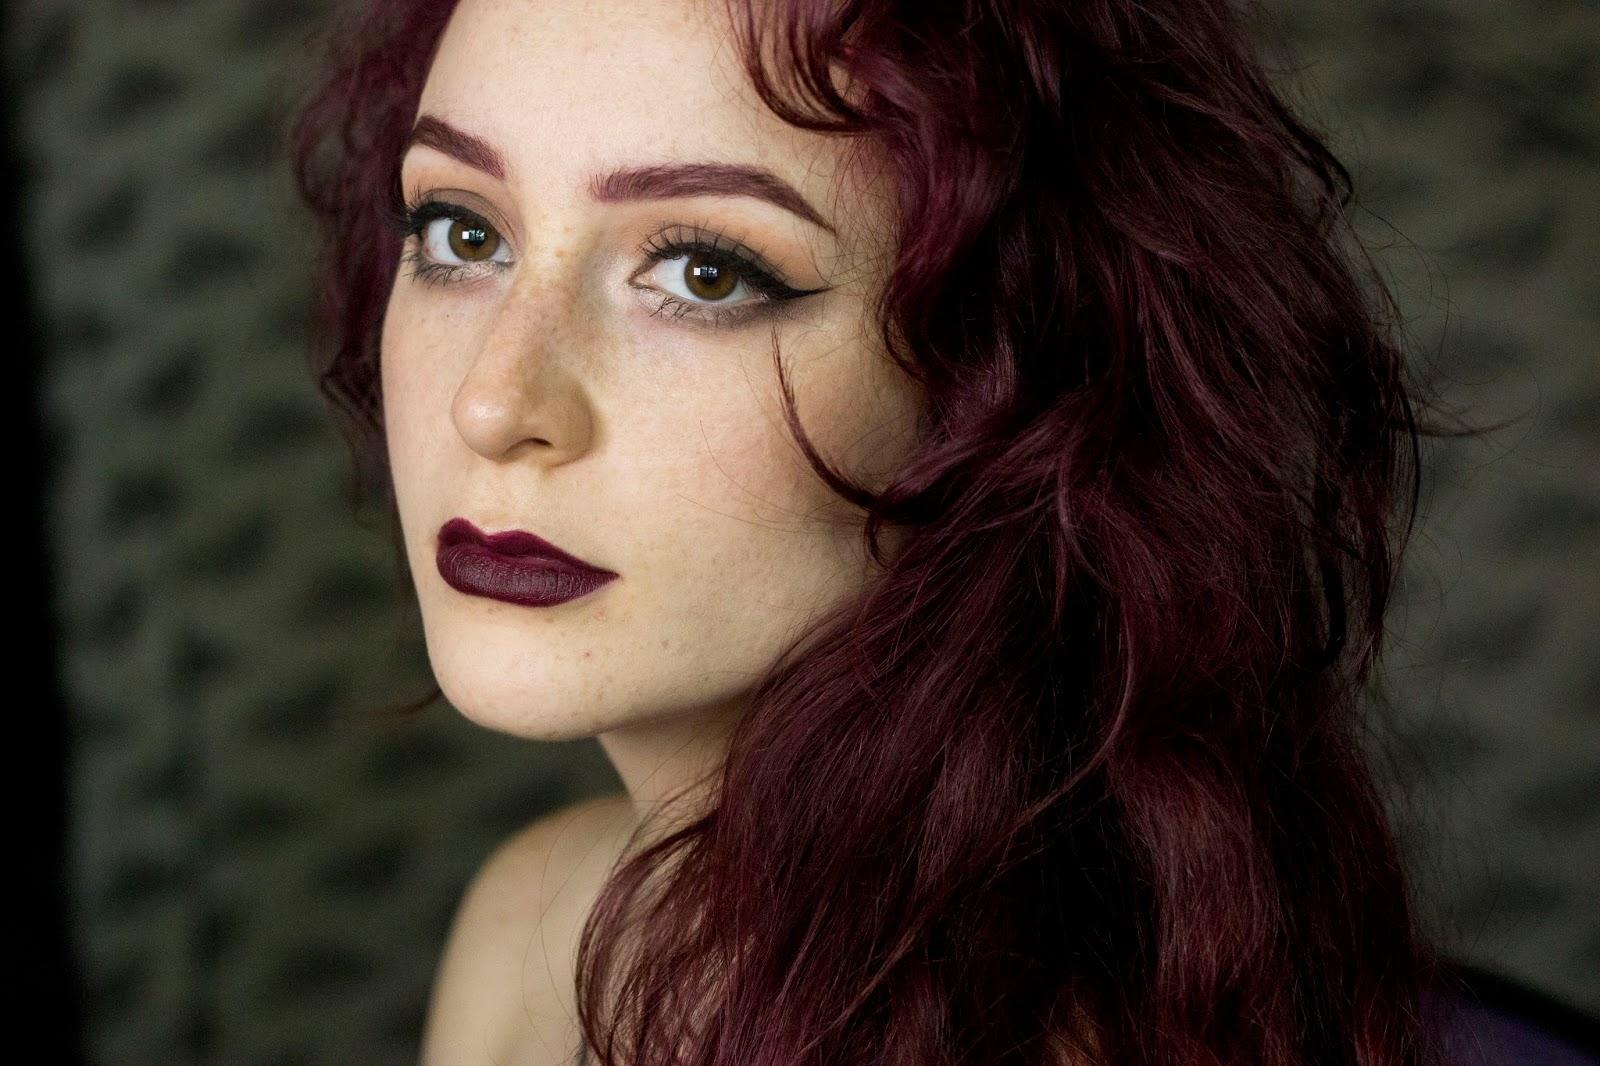 coffee_pls: Brows for Dark Red Hair (OCC Black Dahlia)